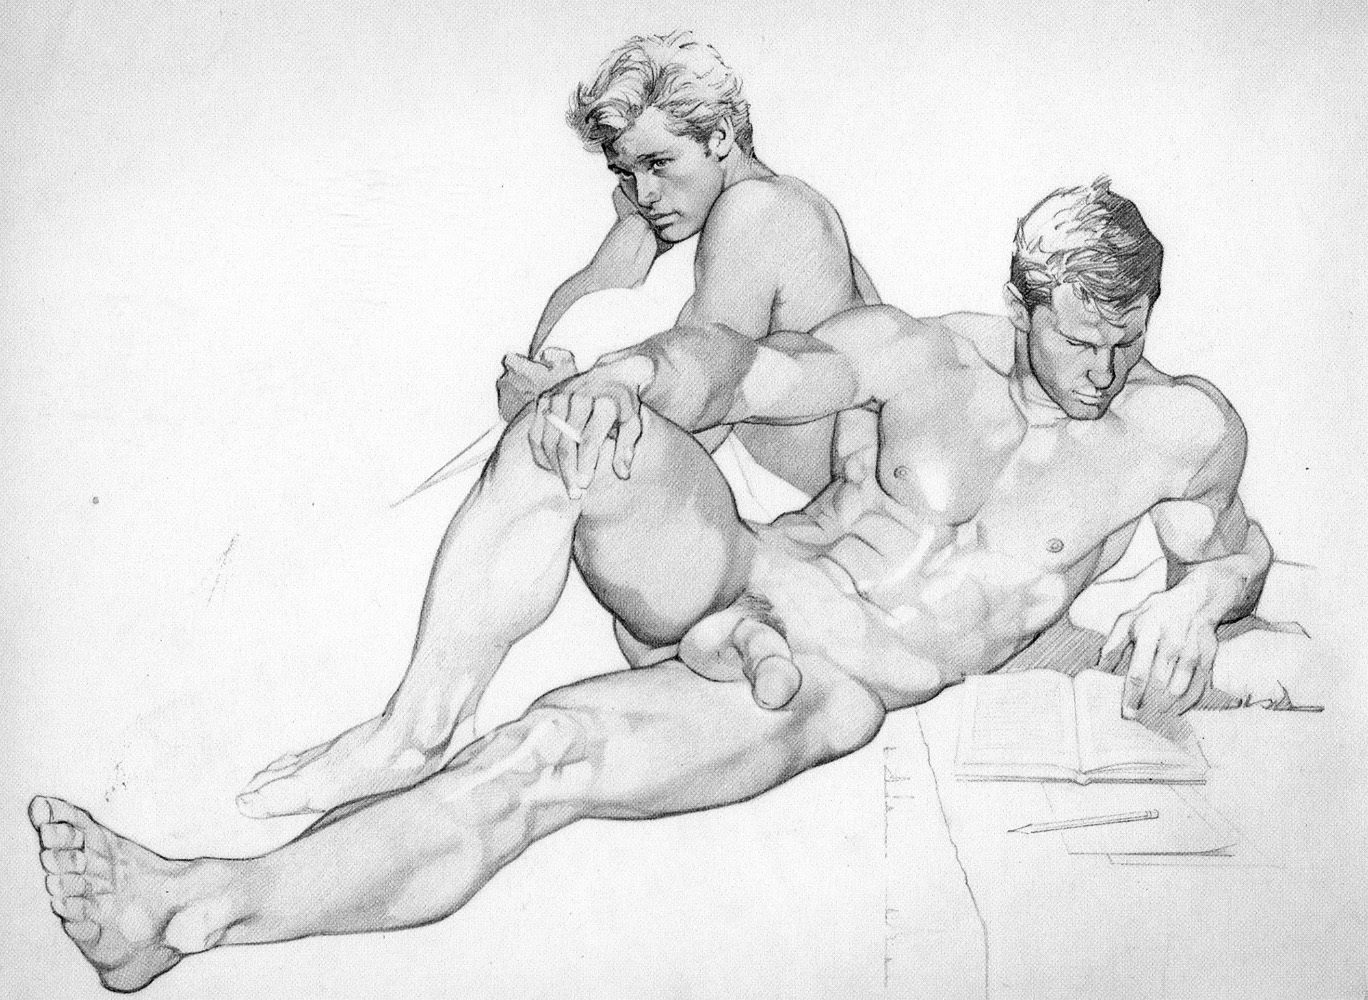 Рисунки мужчин порно 12 фотография